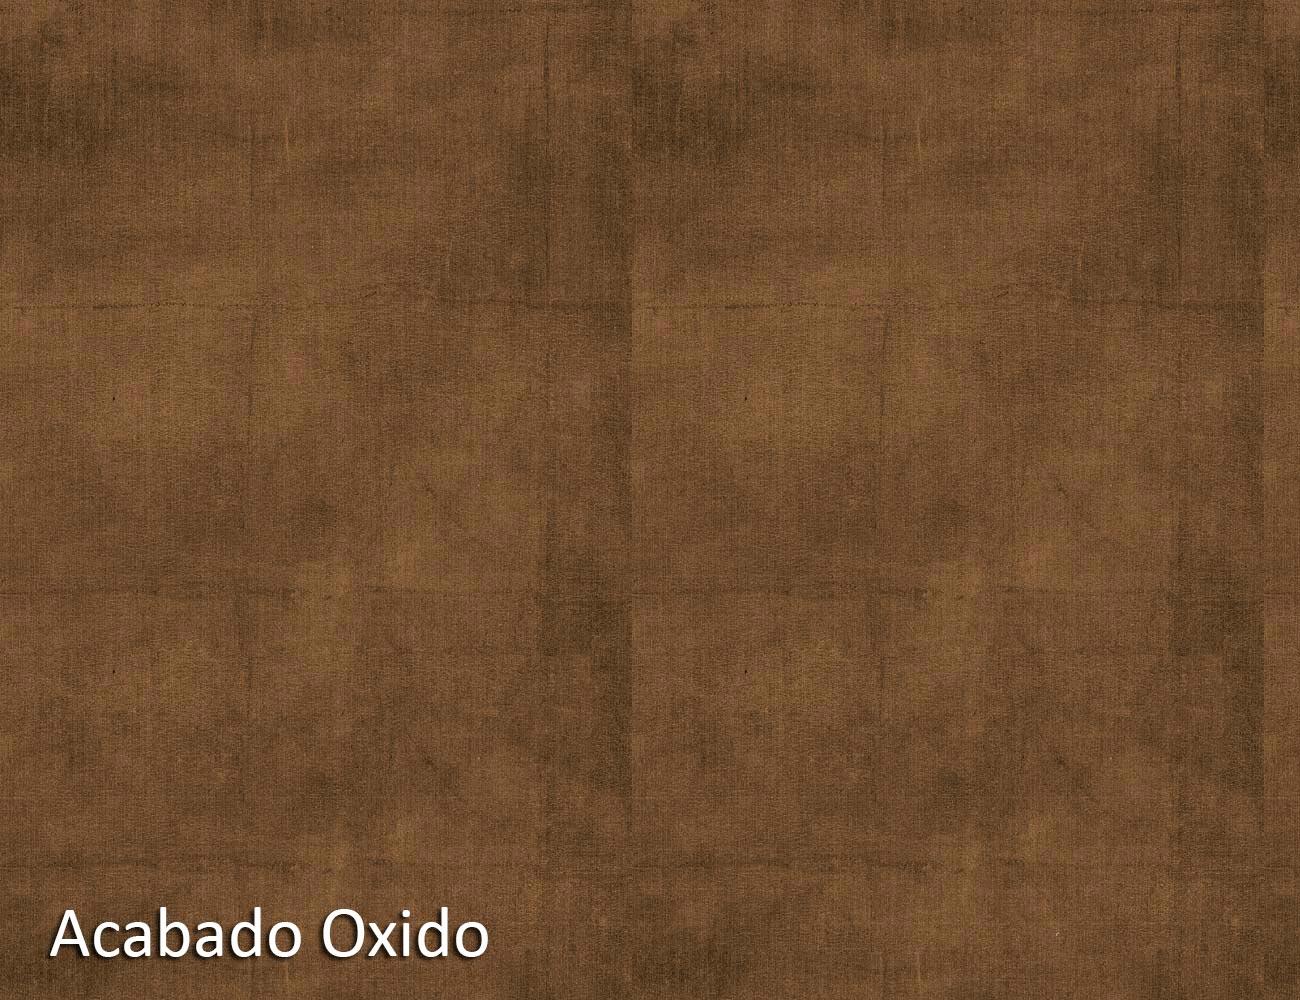 Acabado oxido2